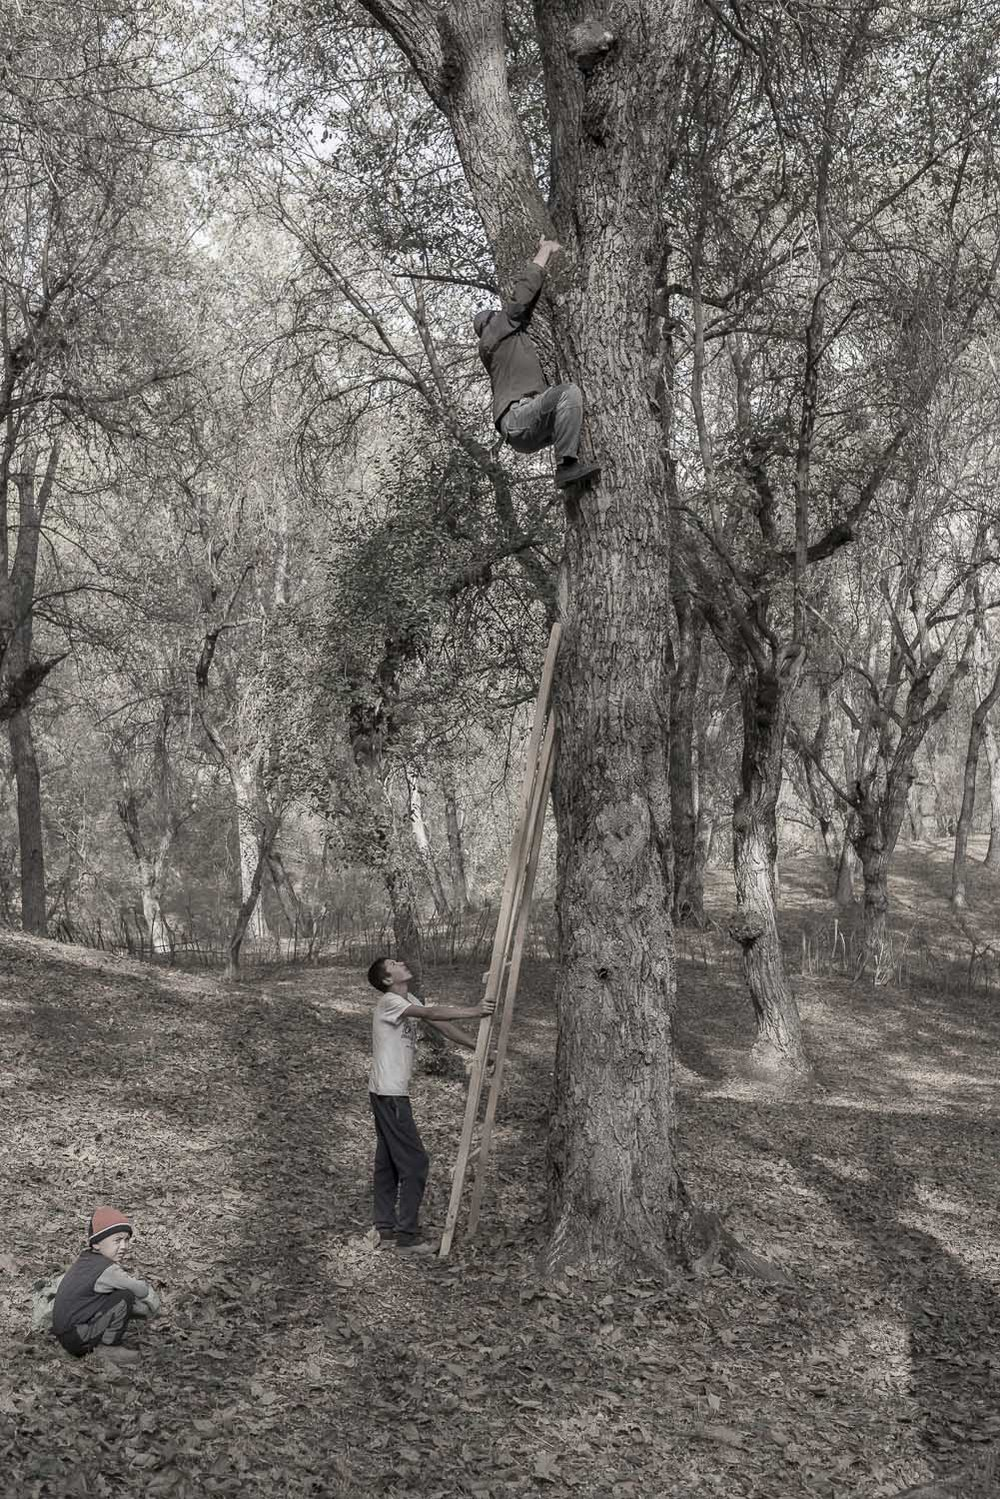 walnut-picking-kyrgyzstan-arslanbob-jo-kearney-photography-video-cheltenham.jpg